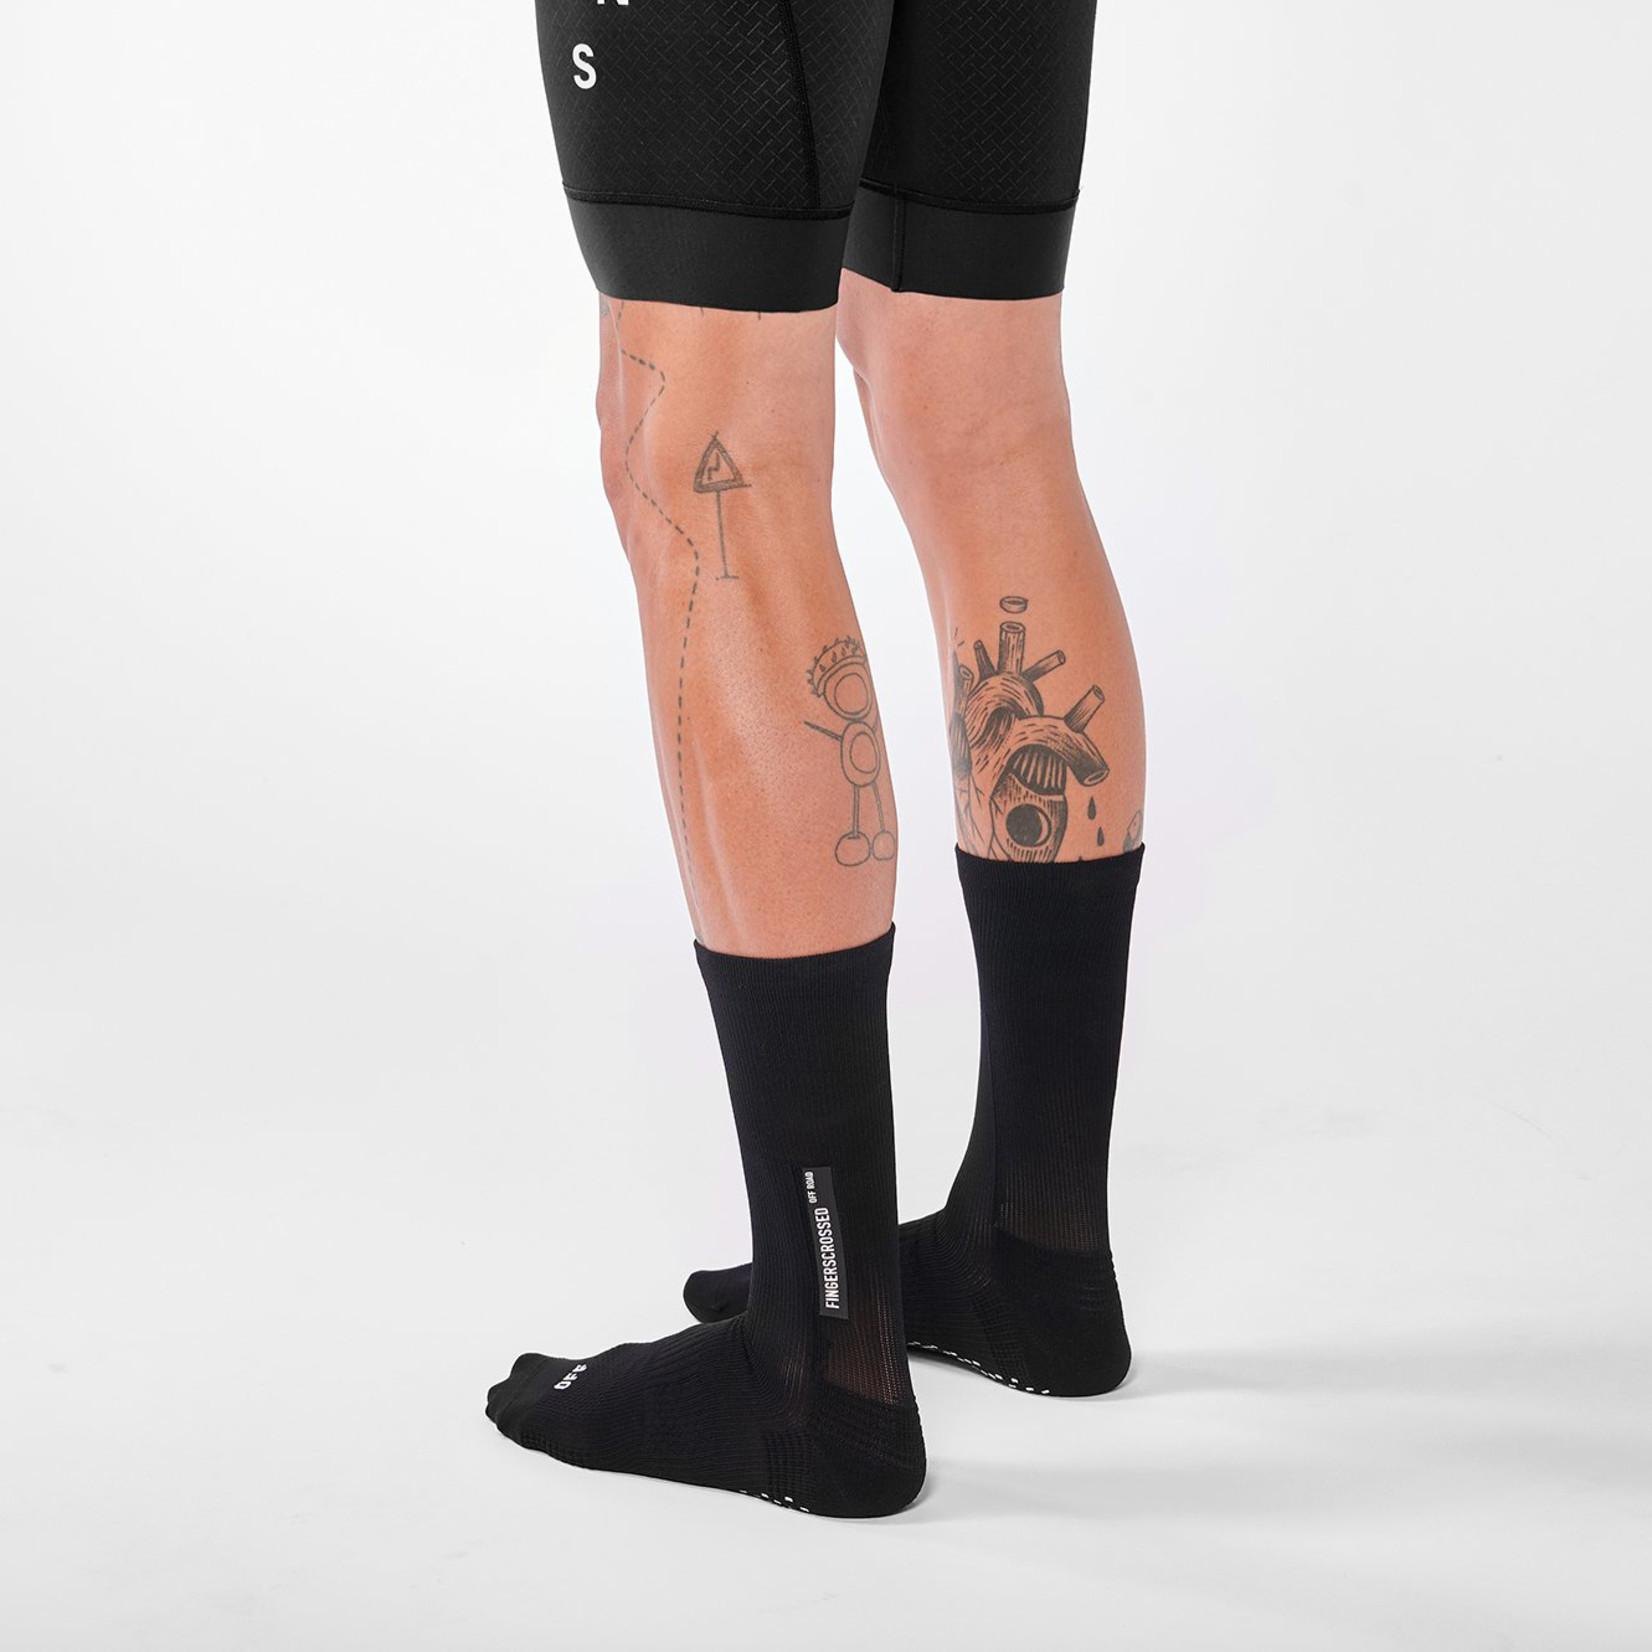 Fingerscrossed FINGERSCROSSED Off Road Socks - Black